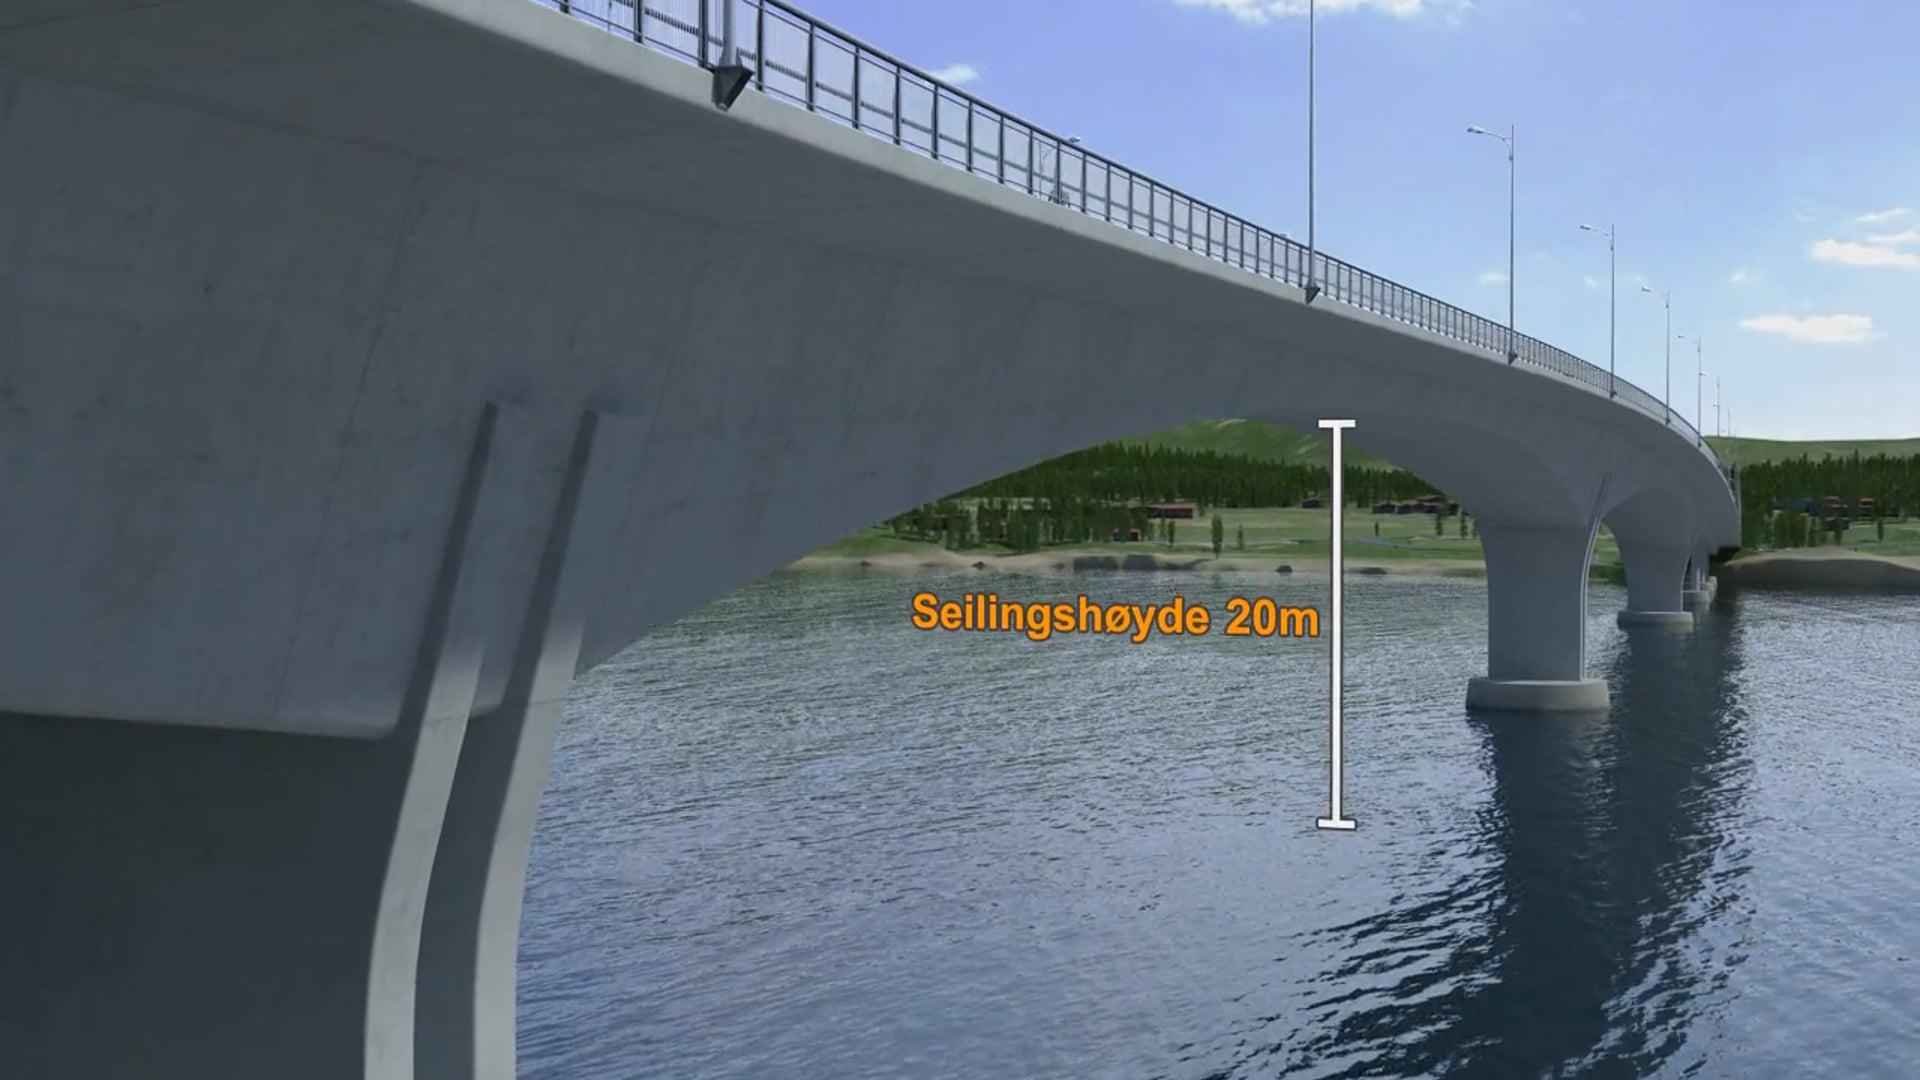 Rv 80 Tverland bridge, Bodø, Norway 2011